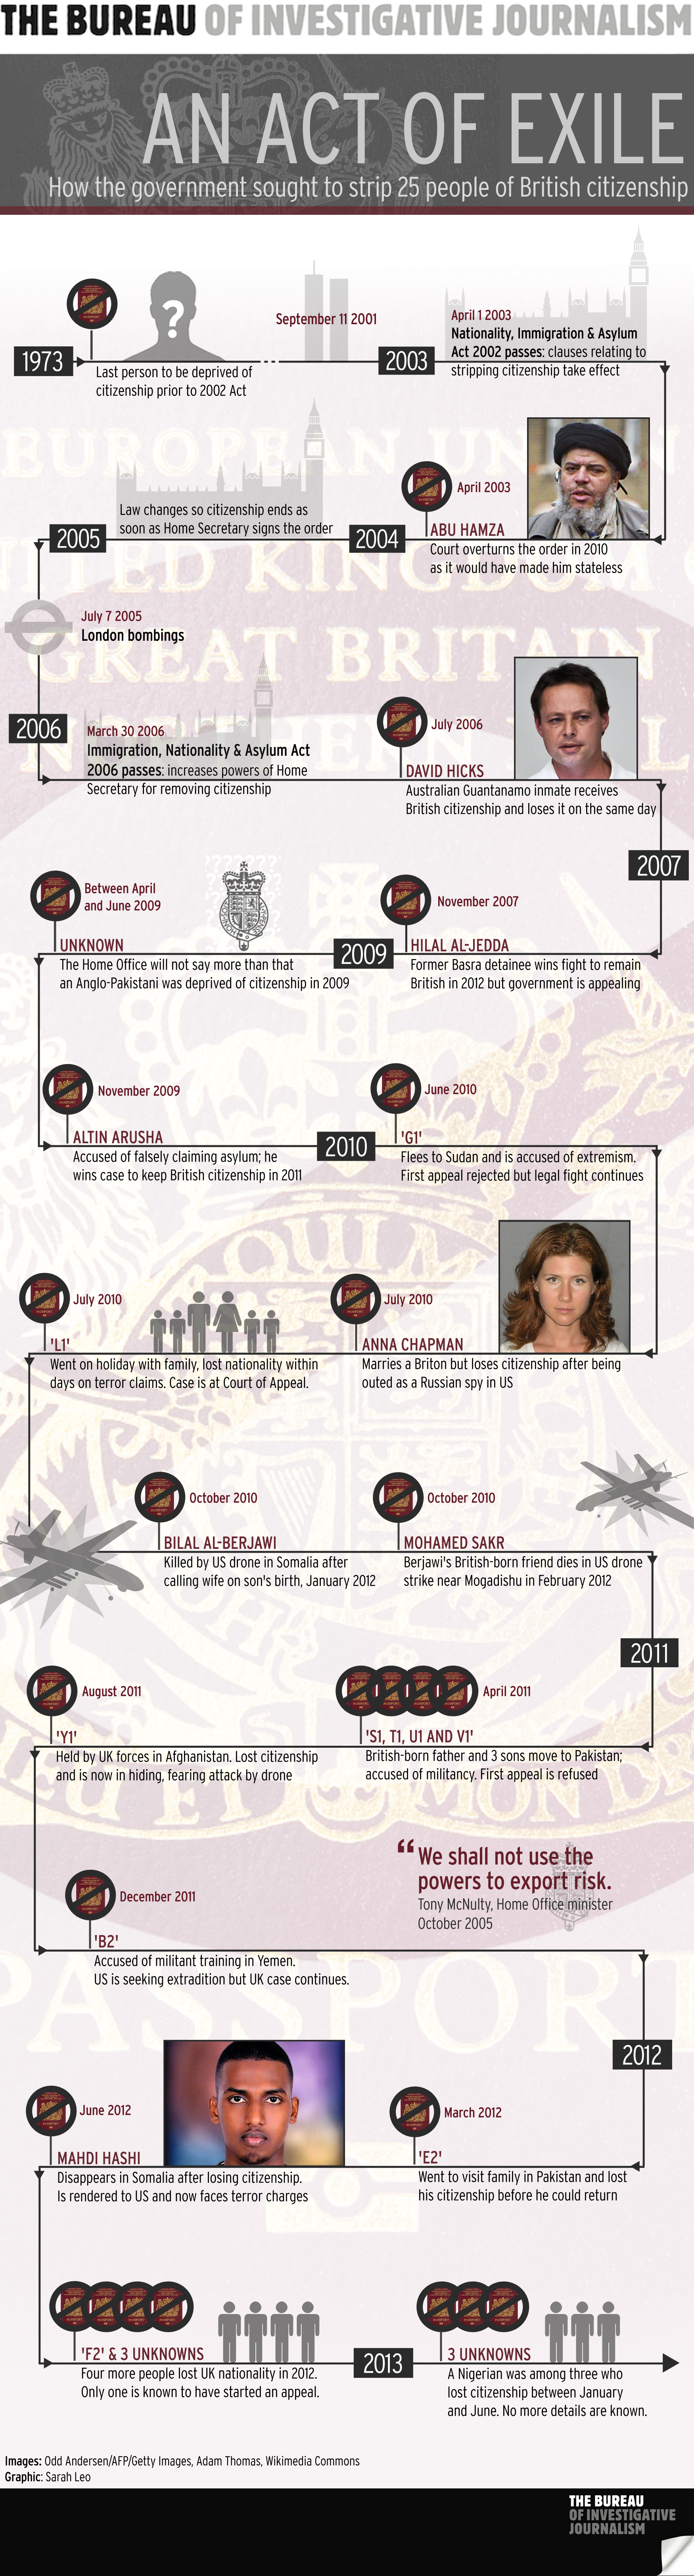 TBIJ Infographic DepCit v2.0